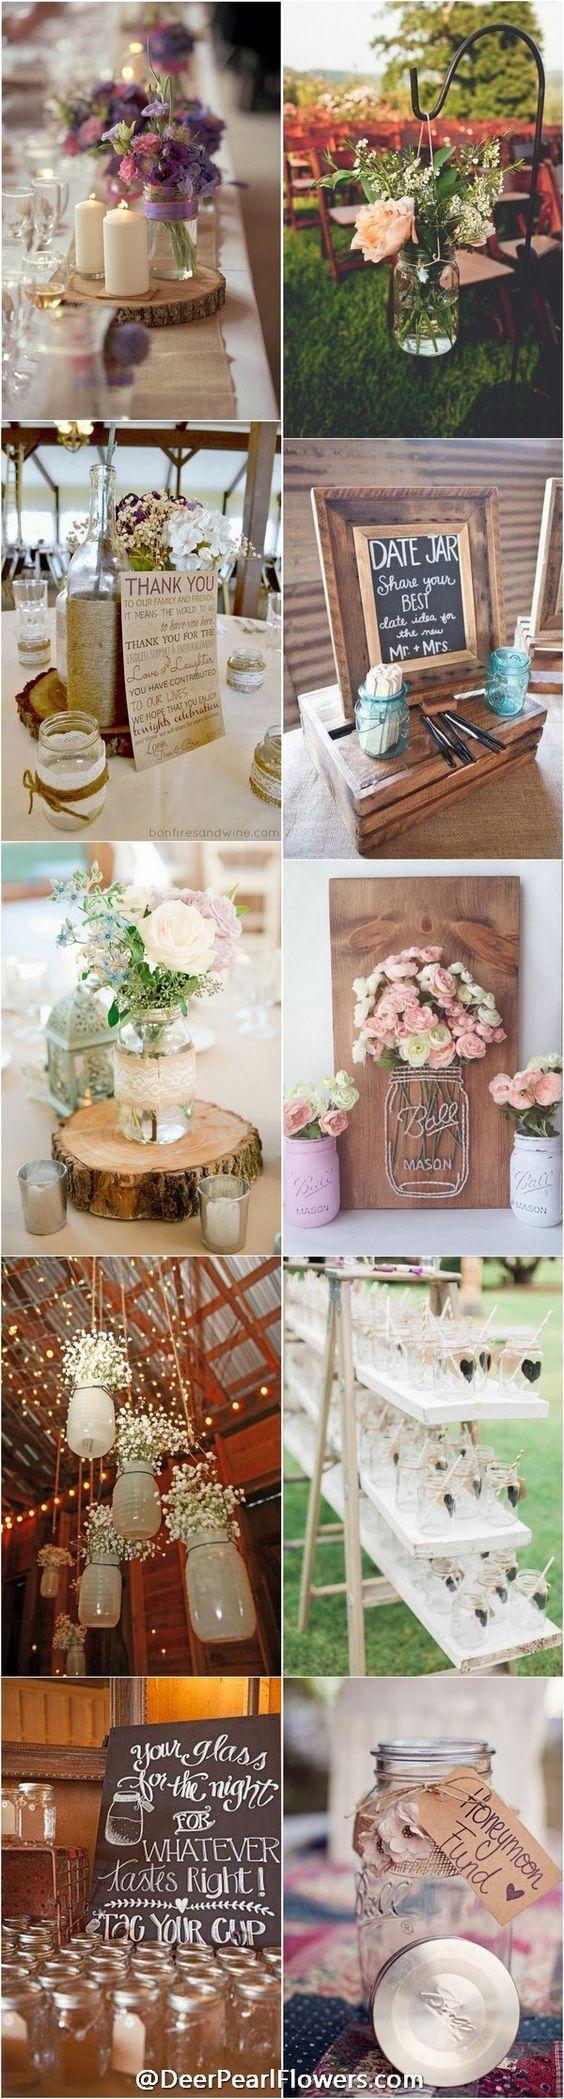 Mason Jar Rustic Wedding Decor Ideas